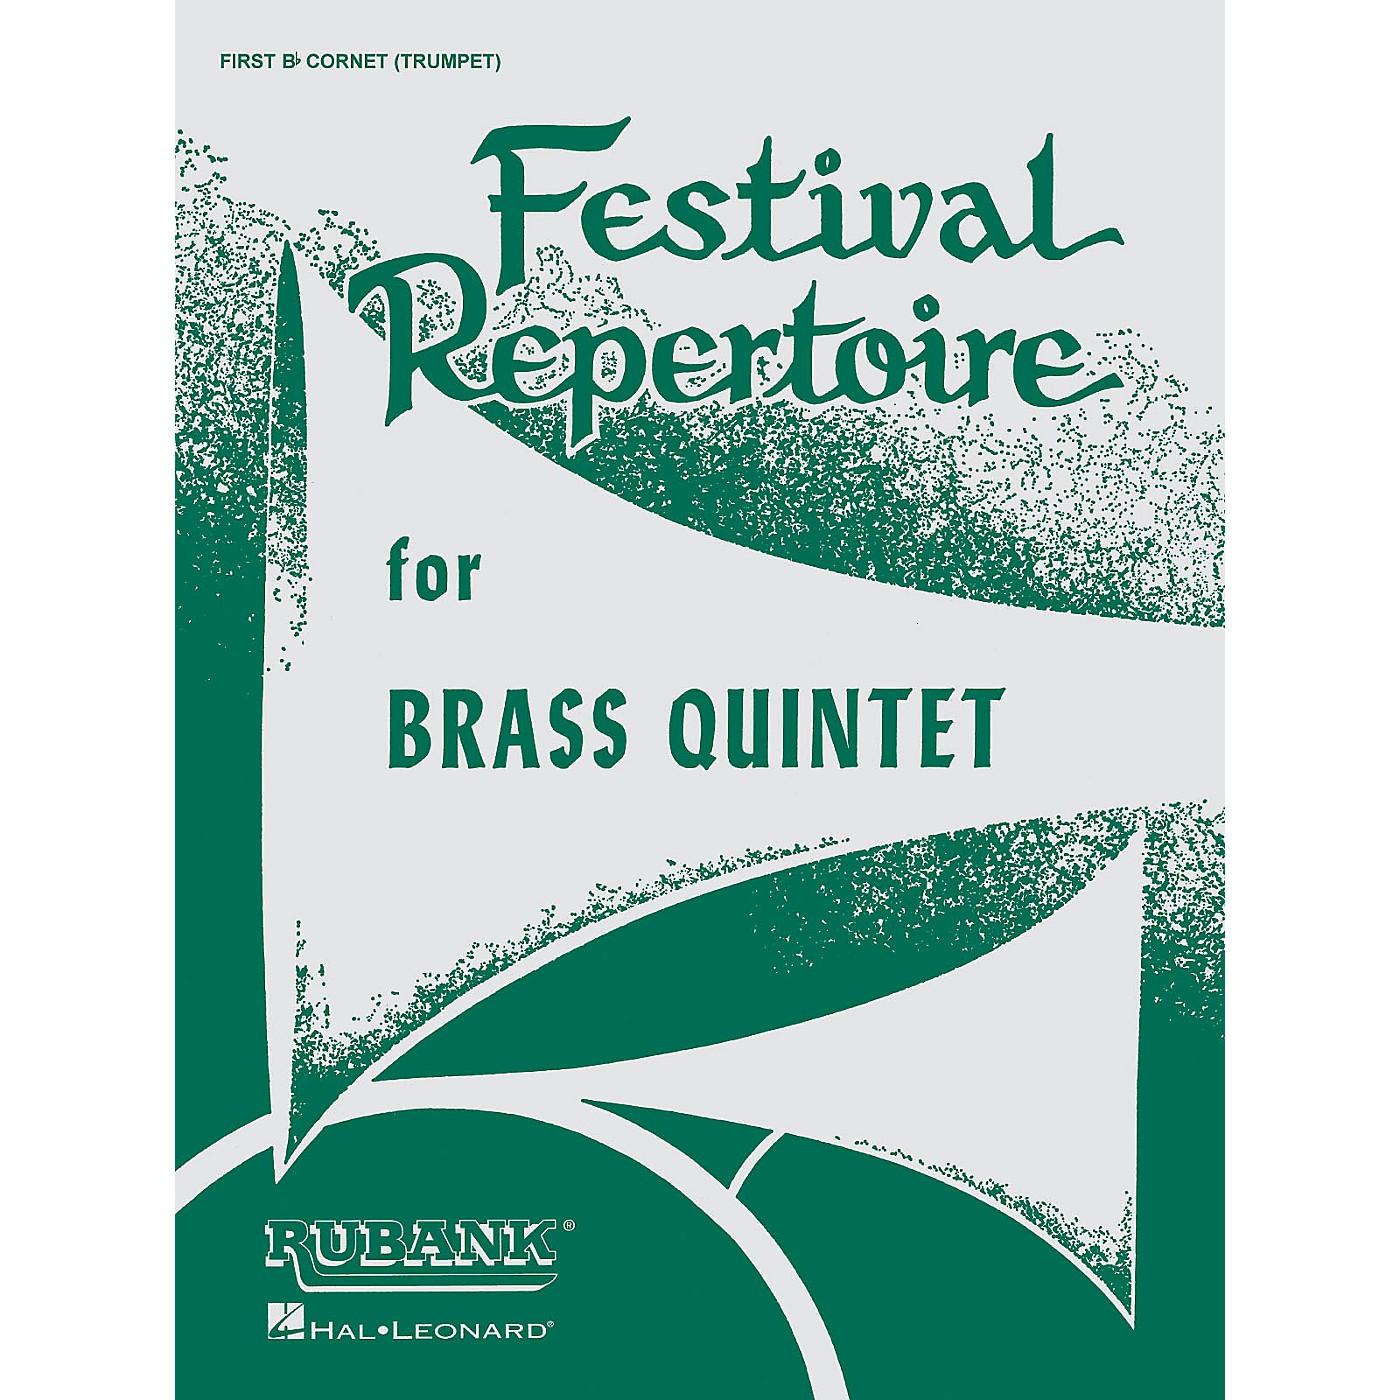 Rubank Publications Festival Repertoire for Brass Quintet (Baritone T.C. (4th Part)) Ensemble Collection Series thumbnail